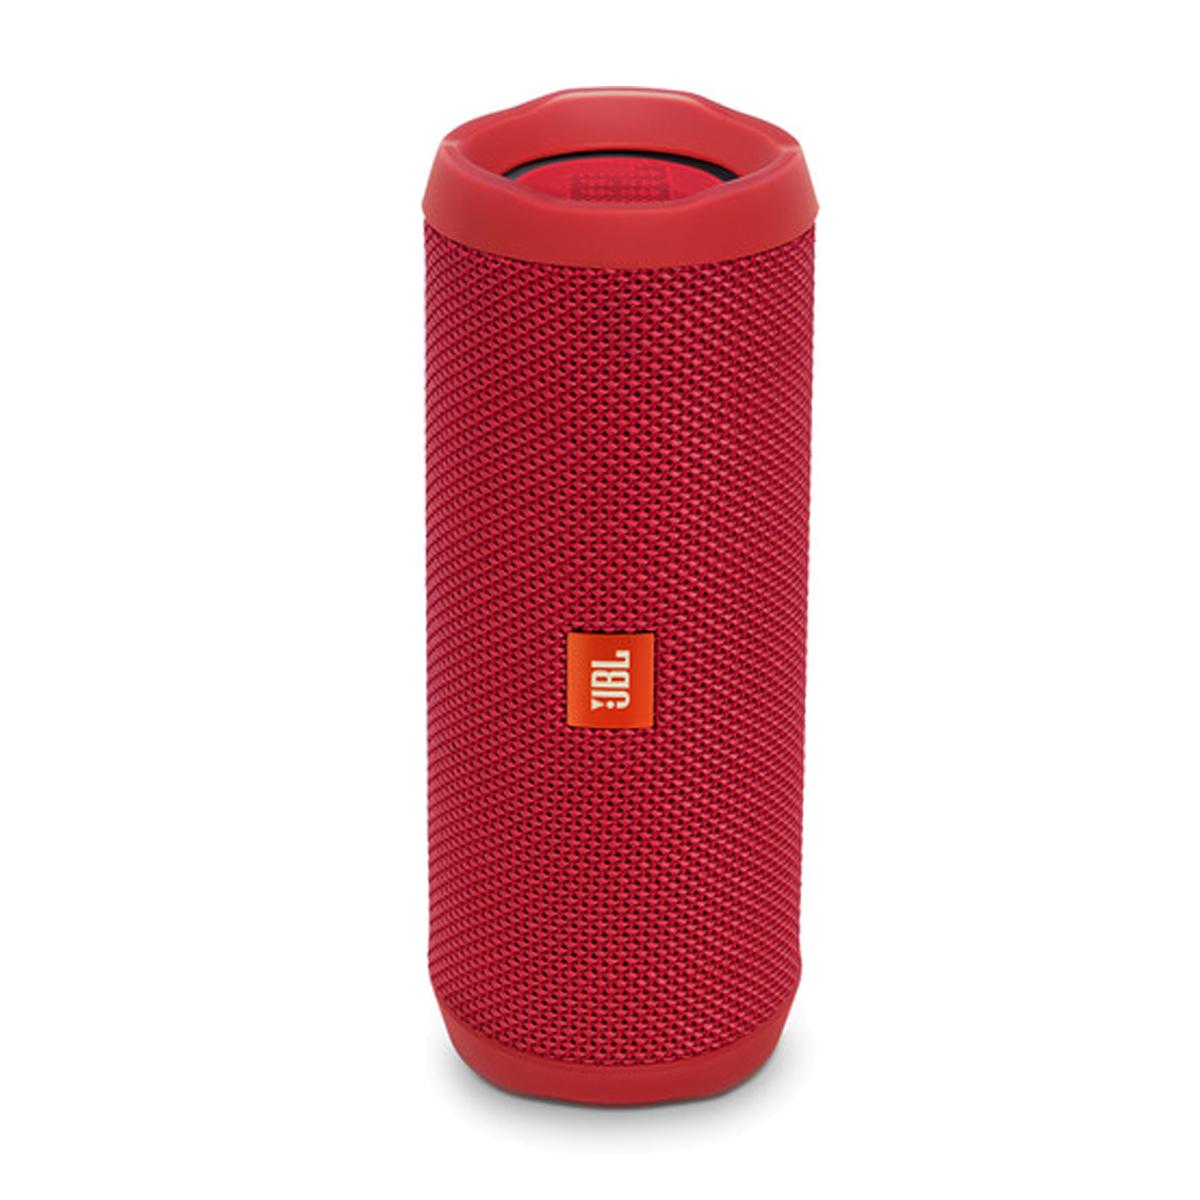 Flip 4 Wireless Bluetooth Red -Parallel Import